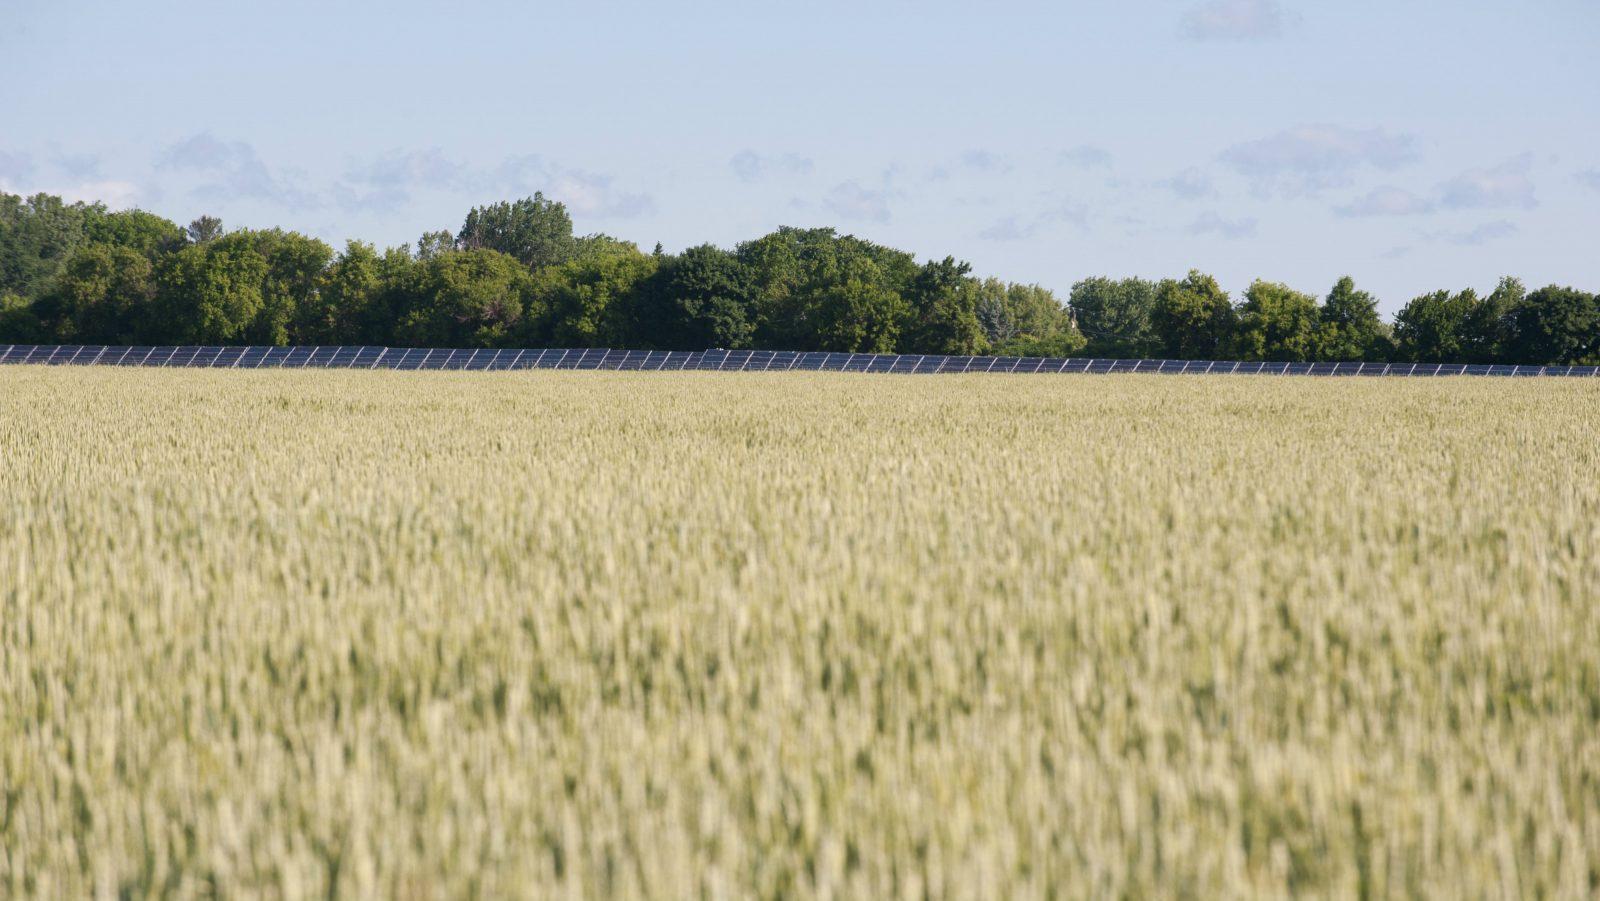 Ithaca College Solar Farm Now Operational